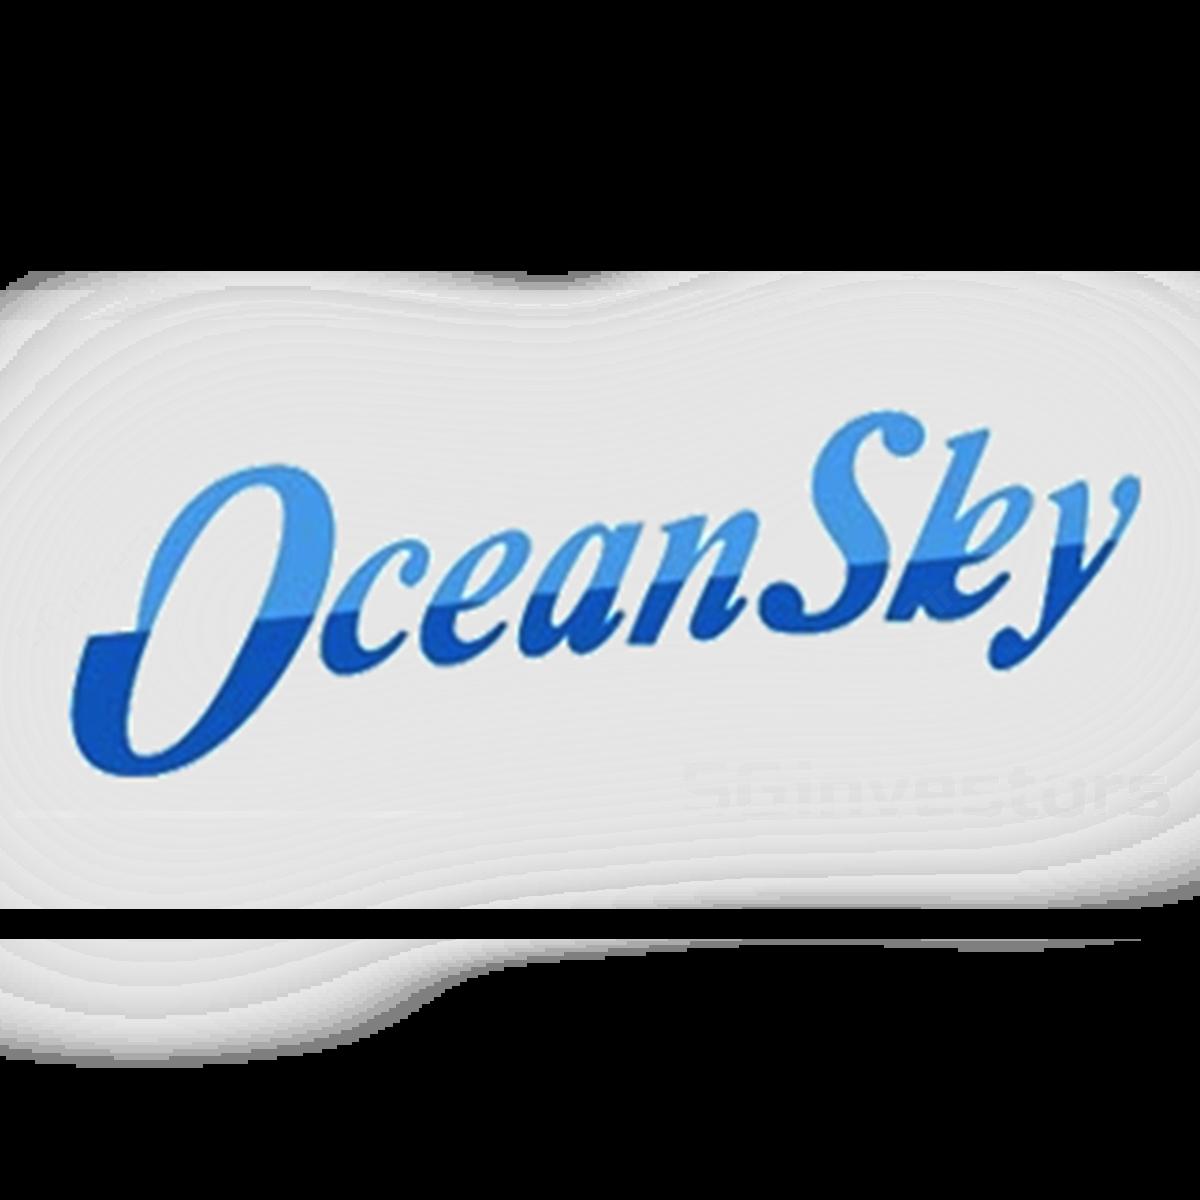 OCEAN SKY INTERNATIONAL LTD (SGX:1B6) @ SGinvestors.io